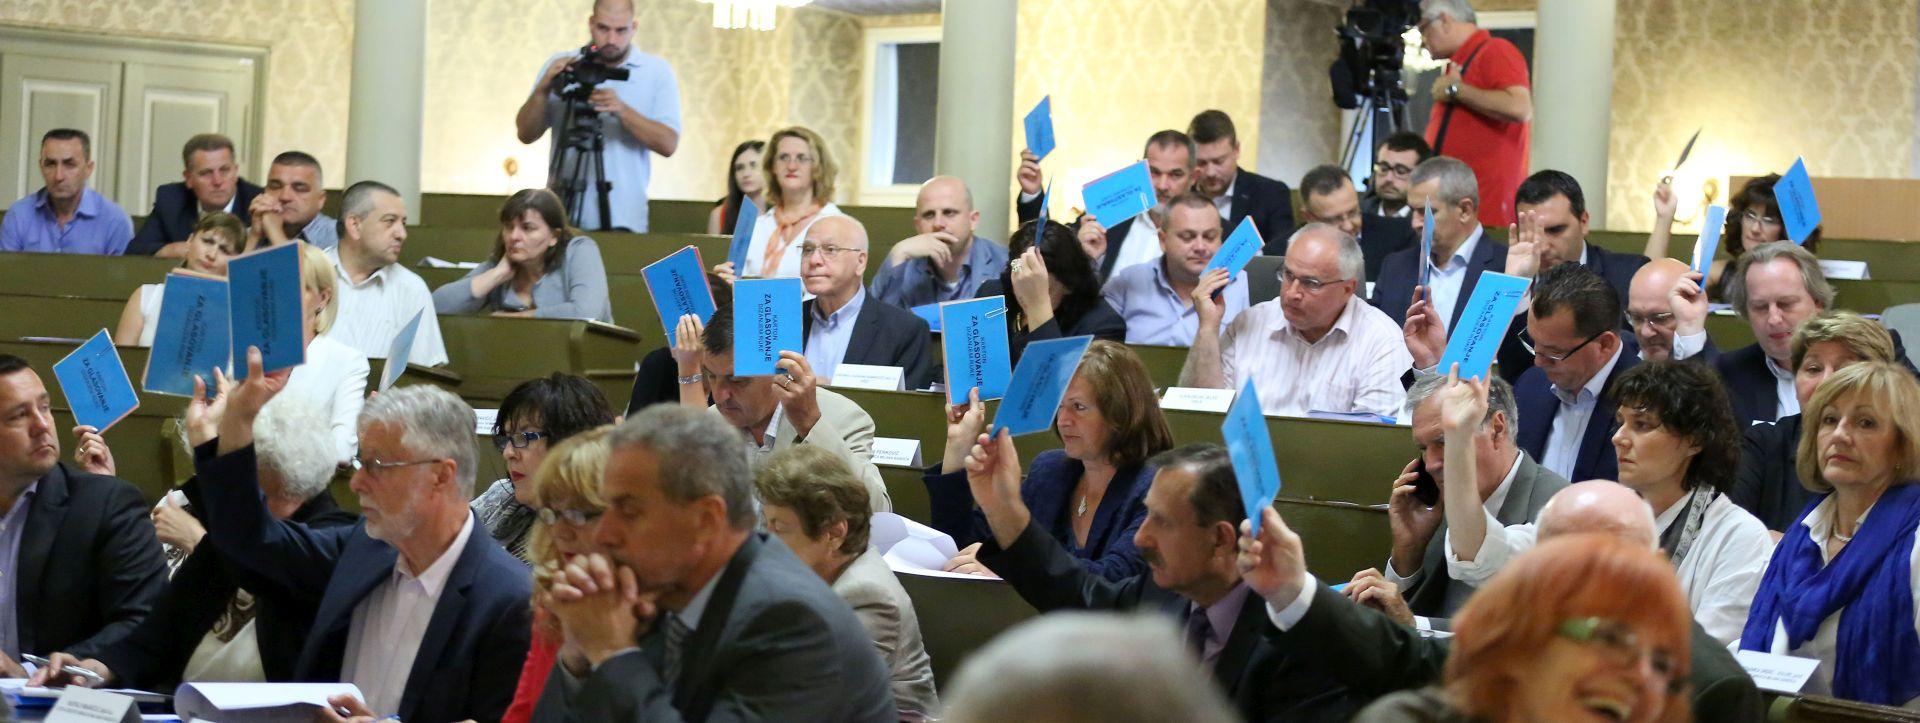 "Gradska skupština prihvatila prijenos osnivačkih prava nad Ustanovom za skrb o ""Tigrovima"" na Grad Zagreb"